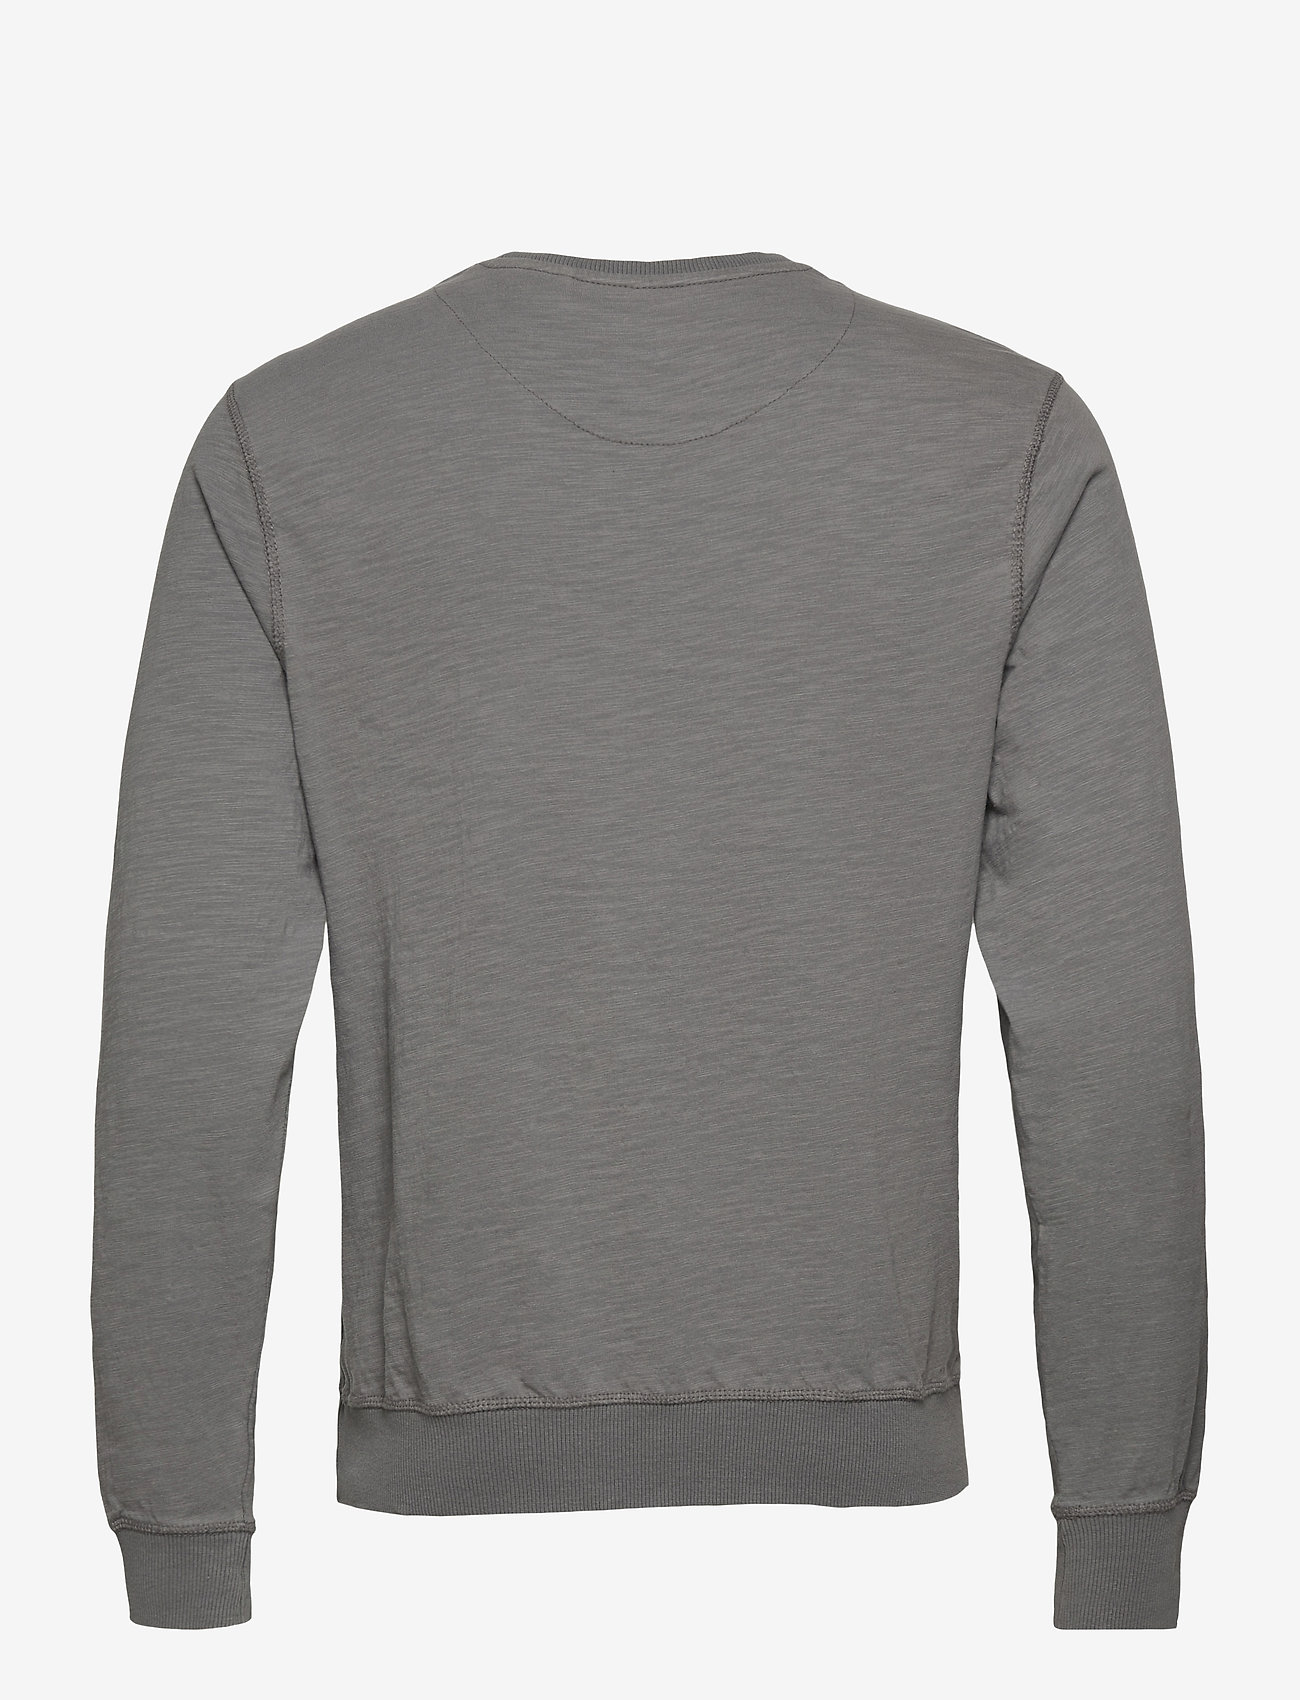 Blend - Sweatshirt - basic sweatshirts - quiet shade - 1